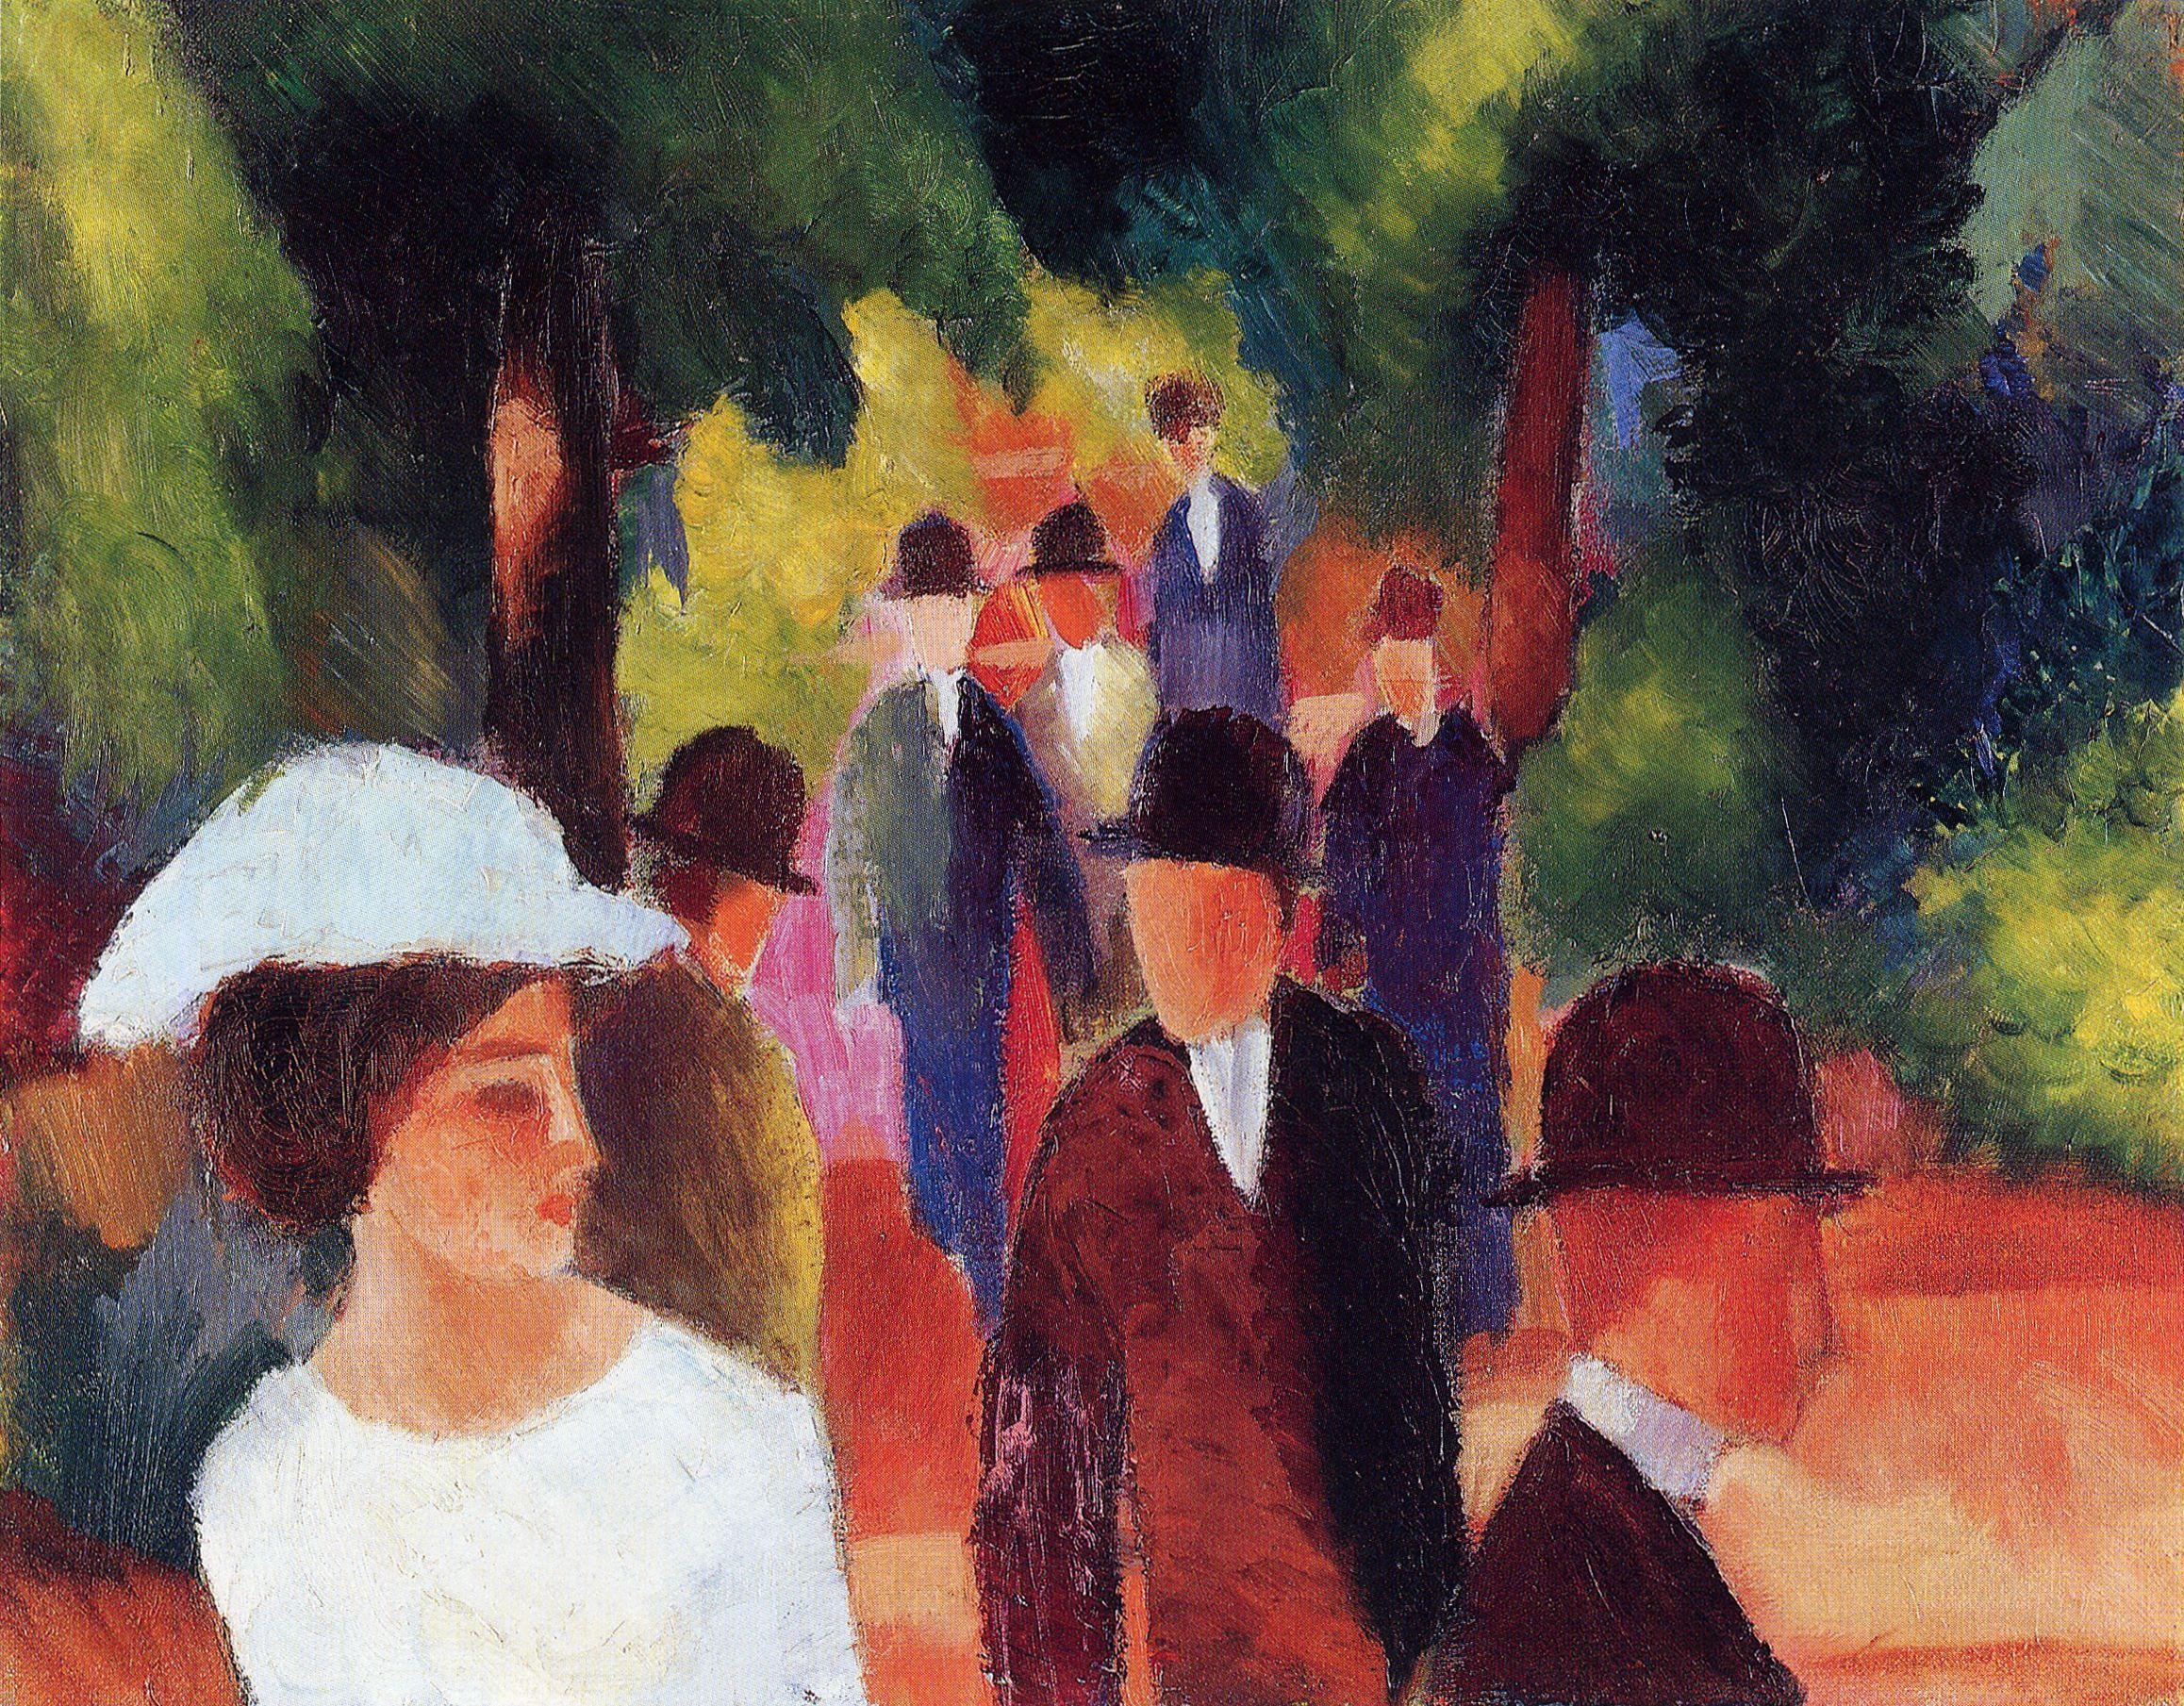 August Macke - Promenade (1914)